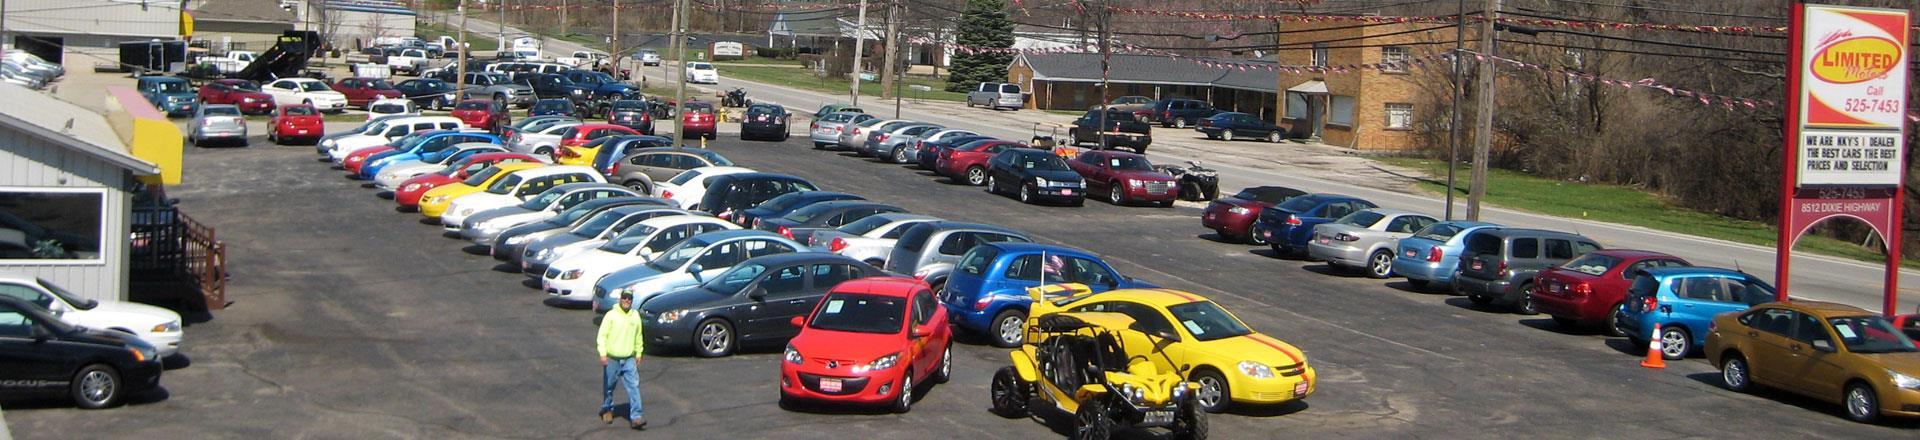 Used Cars Florence KY | Used Cars & Trucks KY | Limited Motors